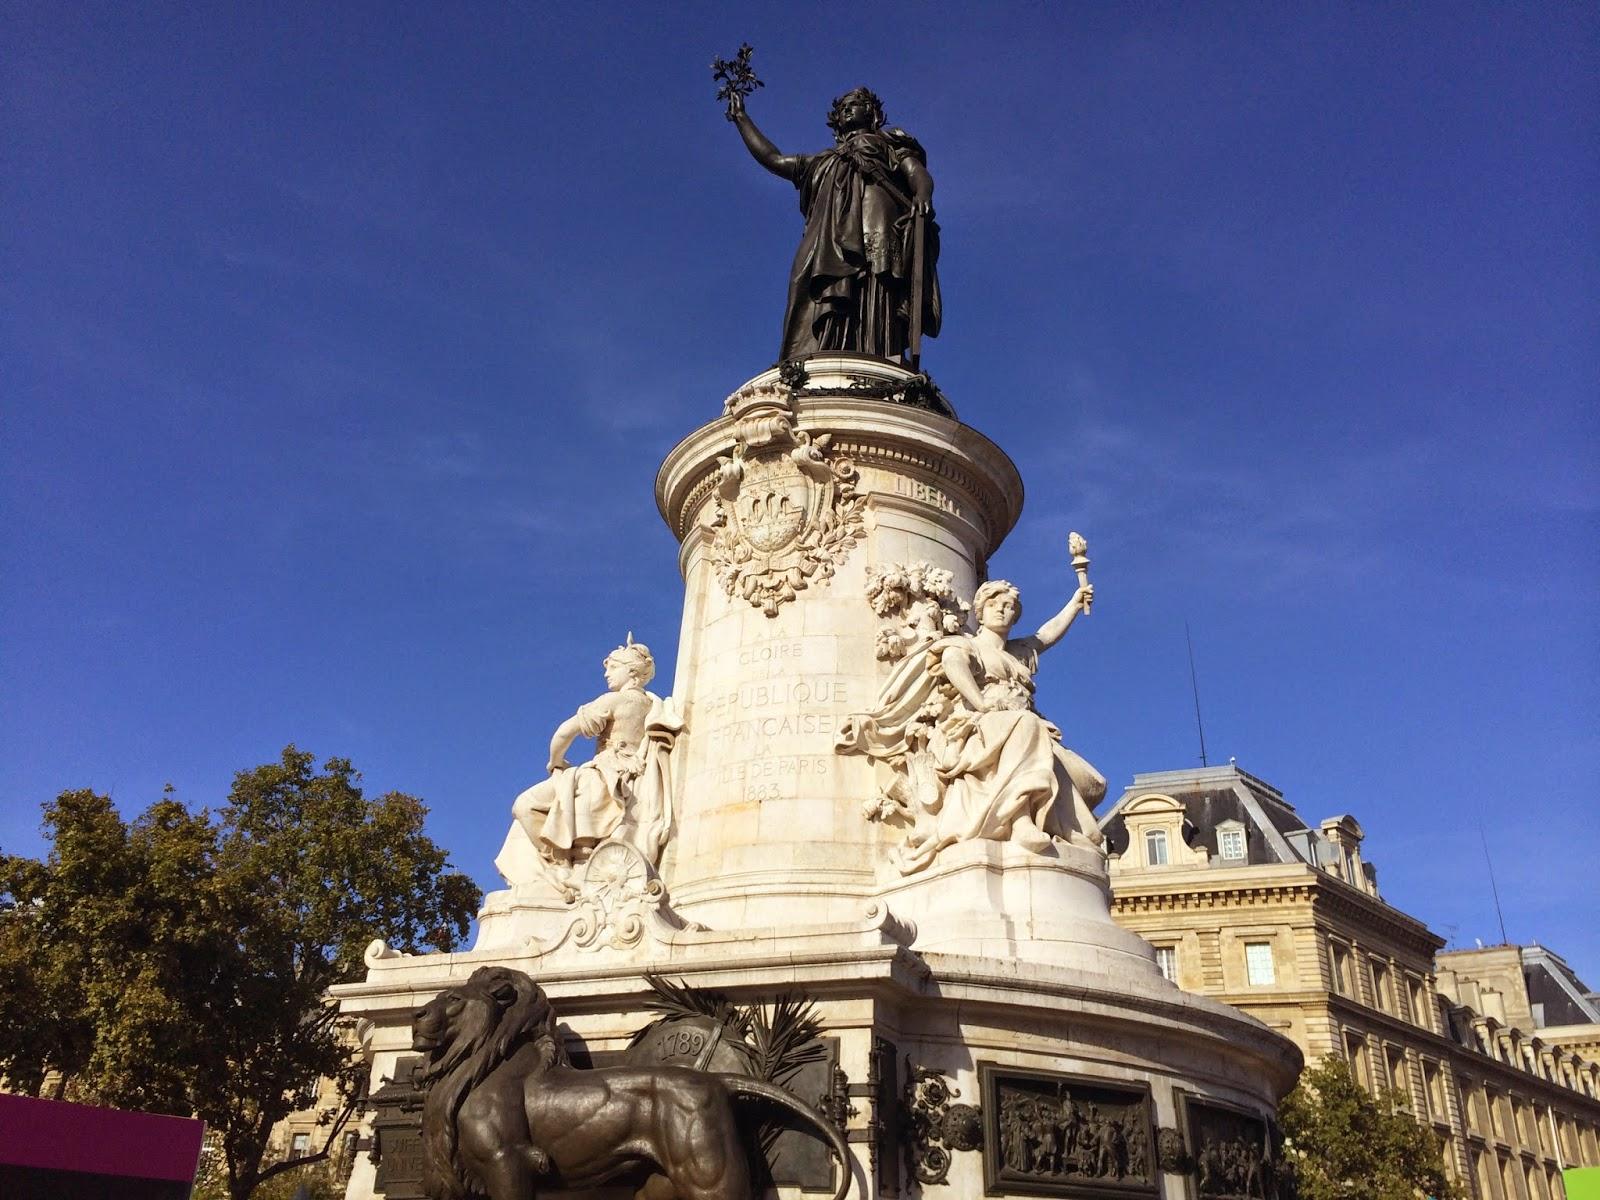 Republique Meydanı